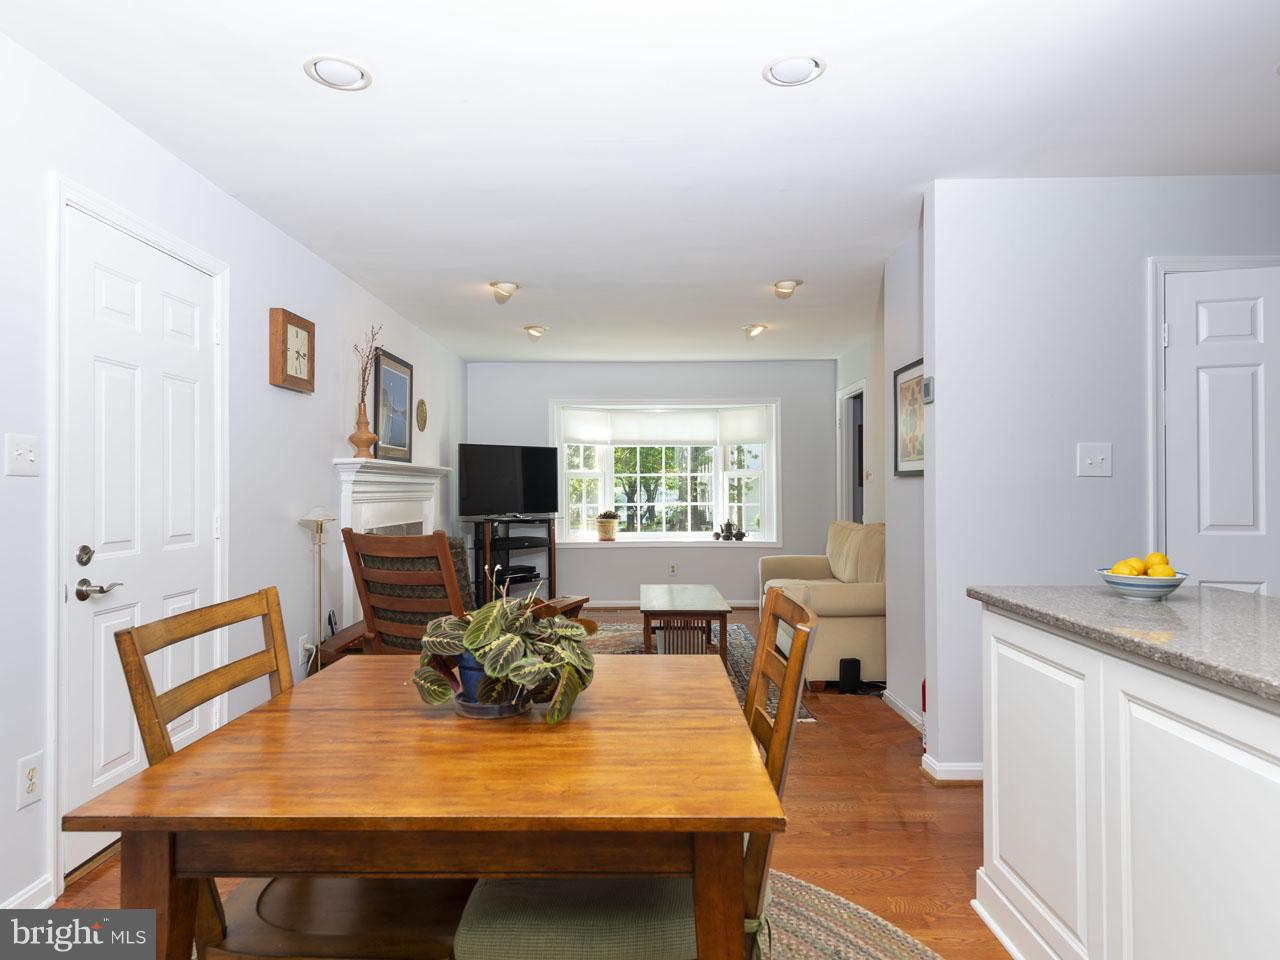 1006211278-300688039627-2021-07-22-07-39-39        Burke Delaware Real Estate For Sale   MLS# 1006211278  - Best of Northern Virginia